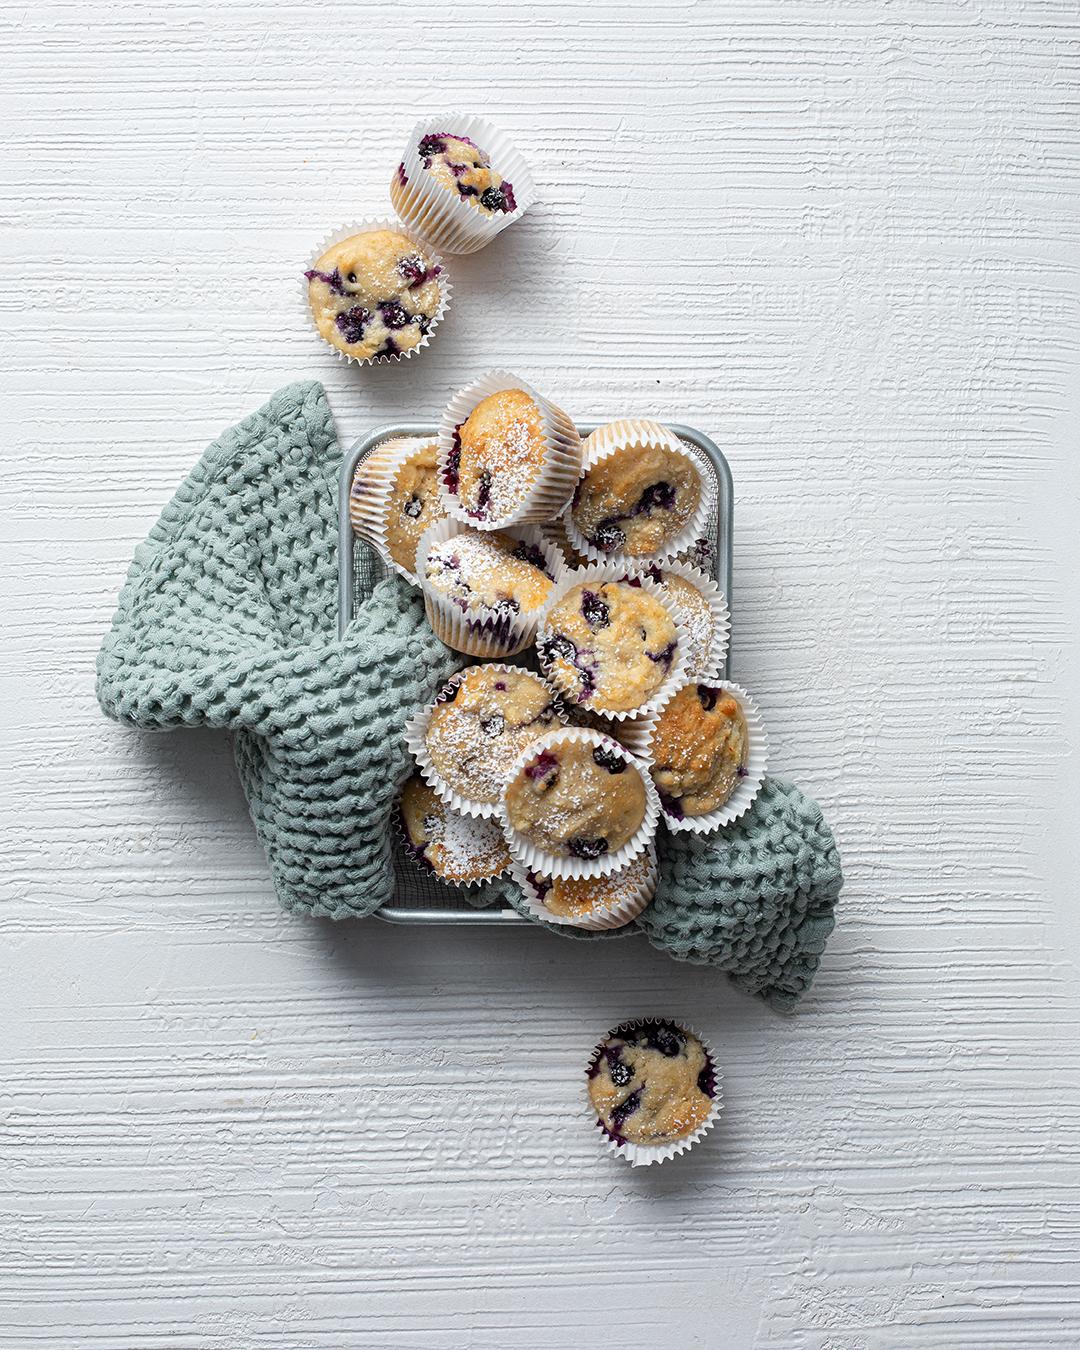 Blueberry, Lemon and Ricotta Muffins